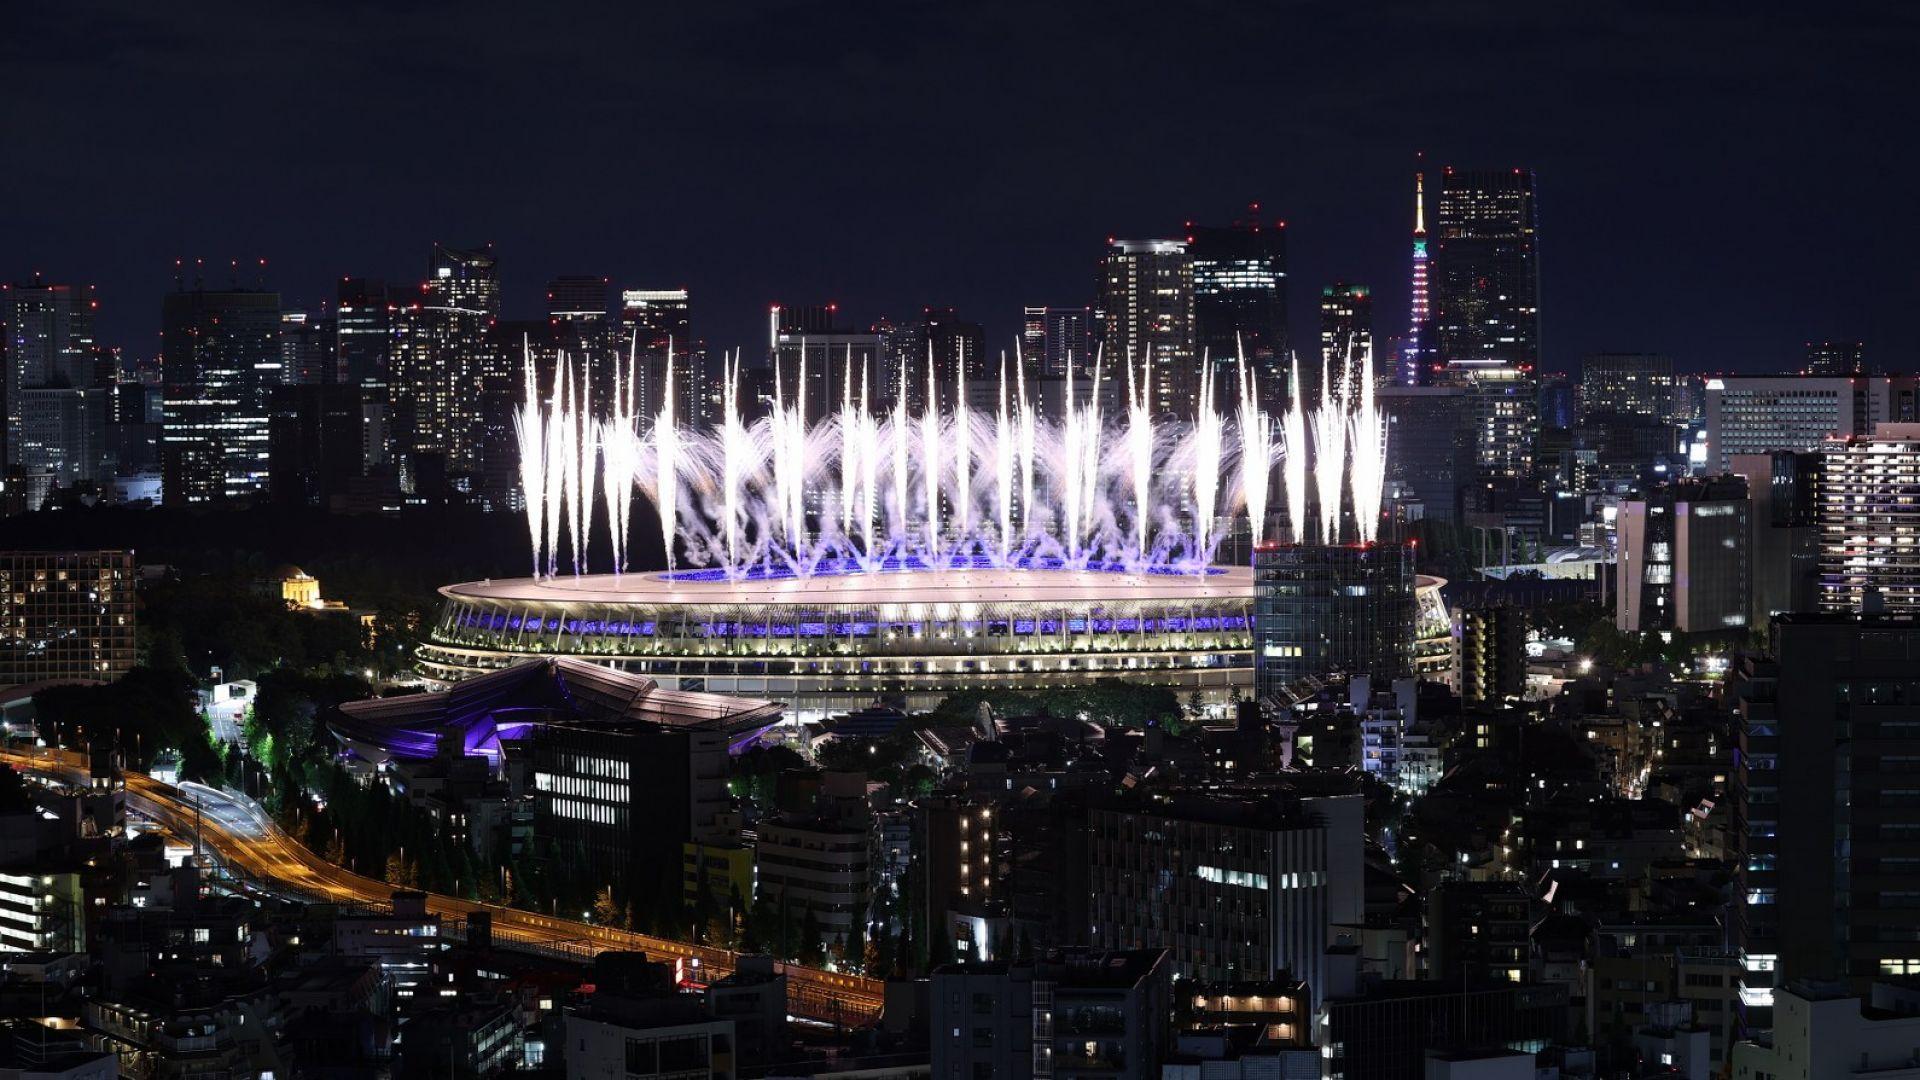 4599 спортисти затвориха заедно Олимпийските игри (видео)